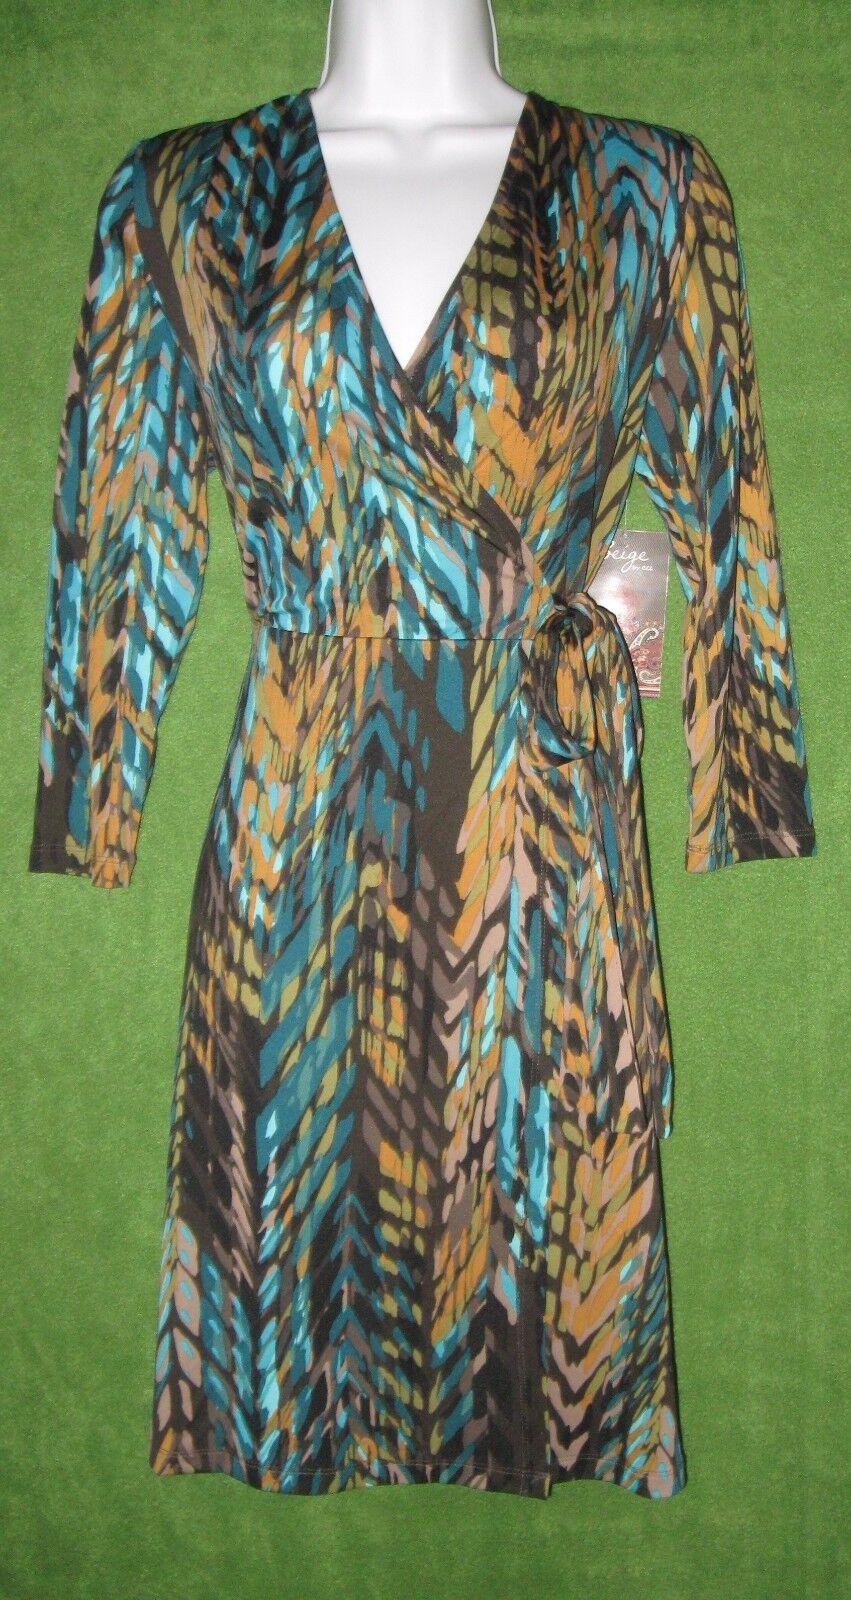 Beige by eci braun Teal Blau Gold Jersey Faux-Wrap Social Dress 14W  PLUS